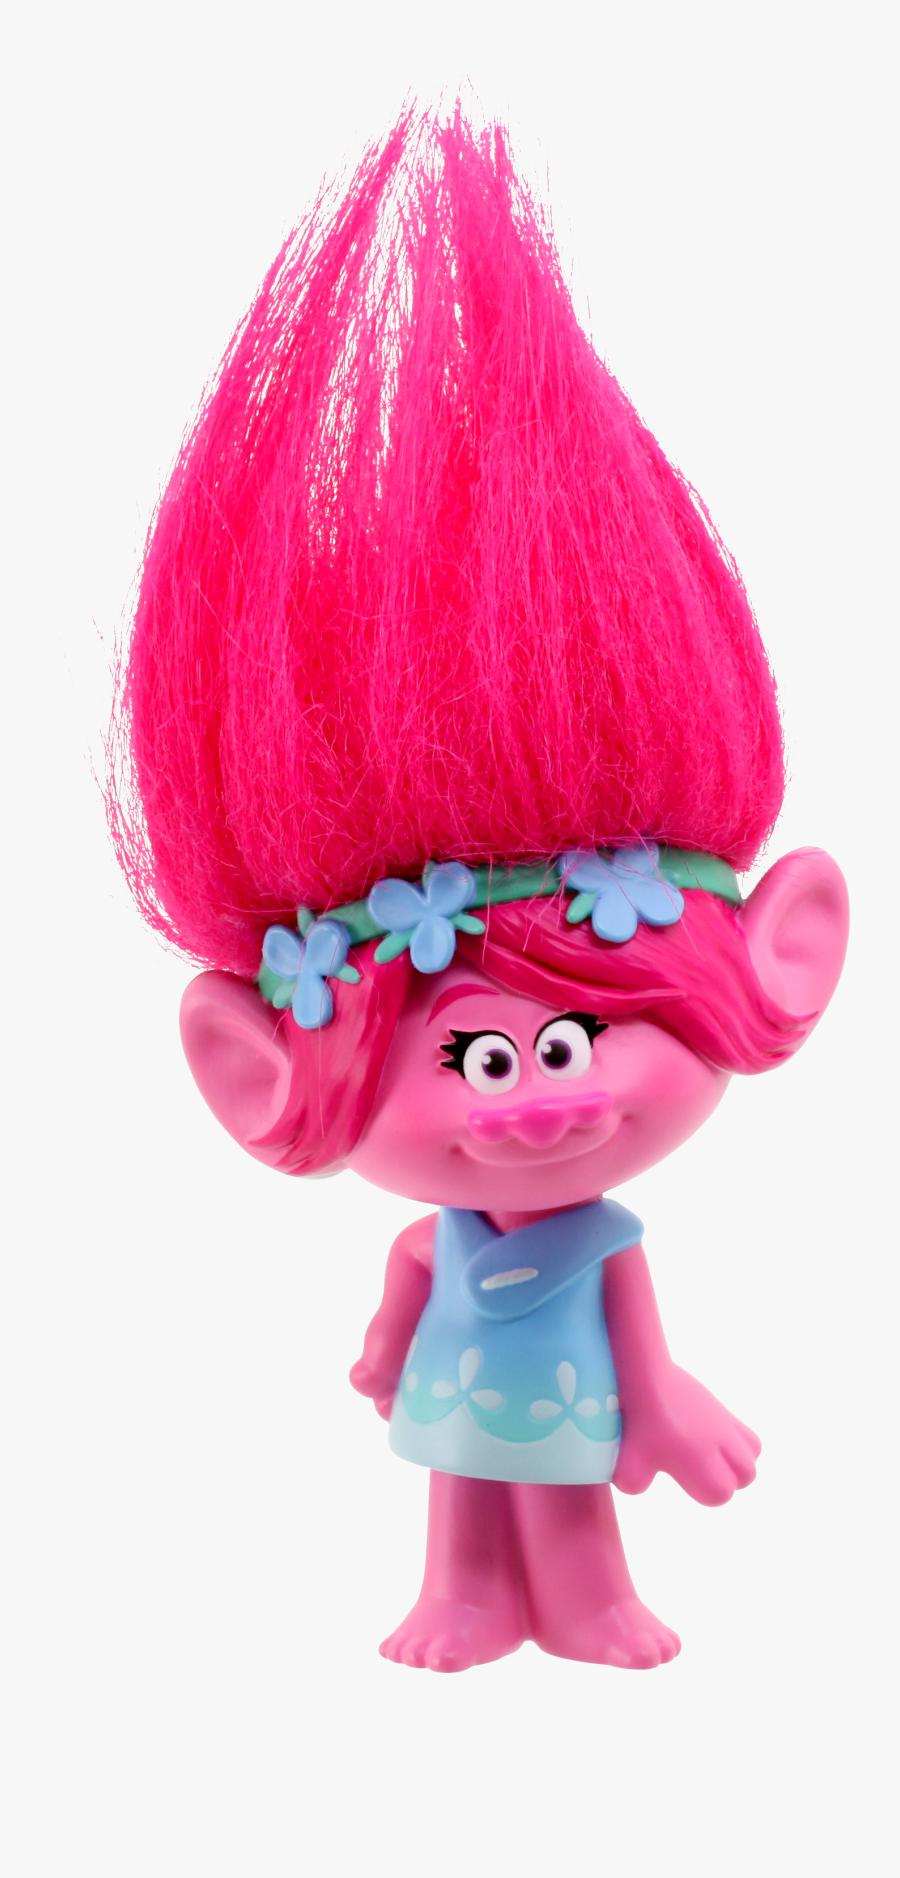 Hd Trolls Llavero Branch - Princesa Poppy Do Trolls Png, Transparent Clipart